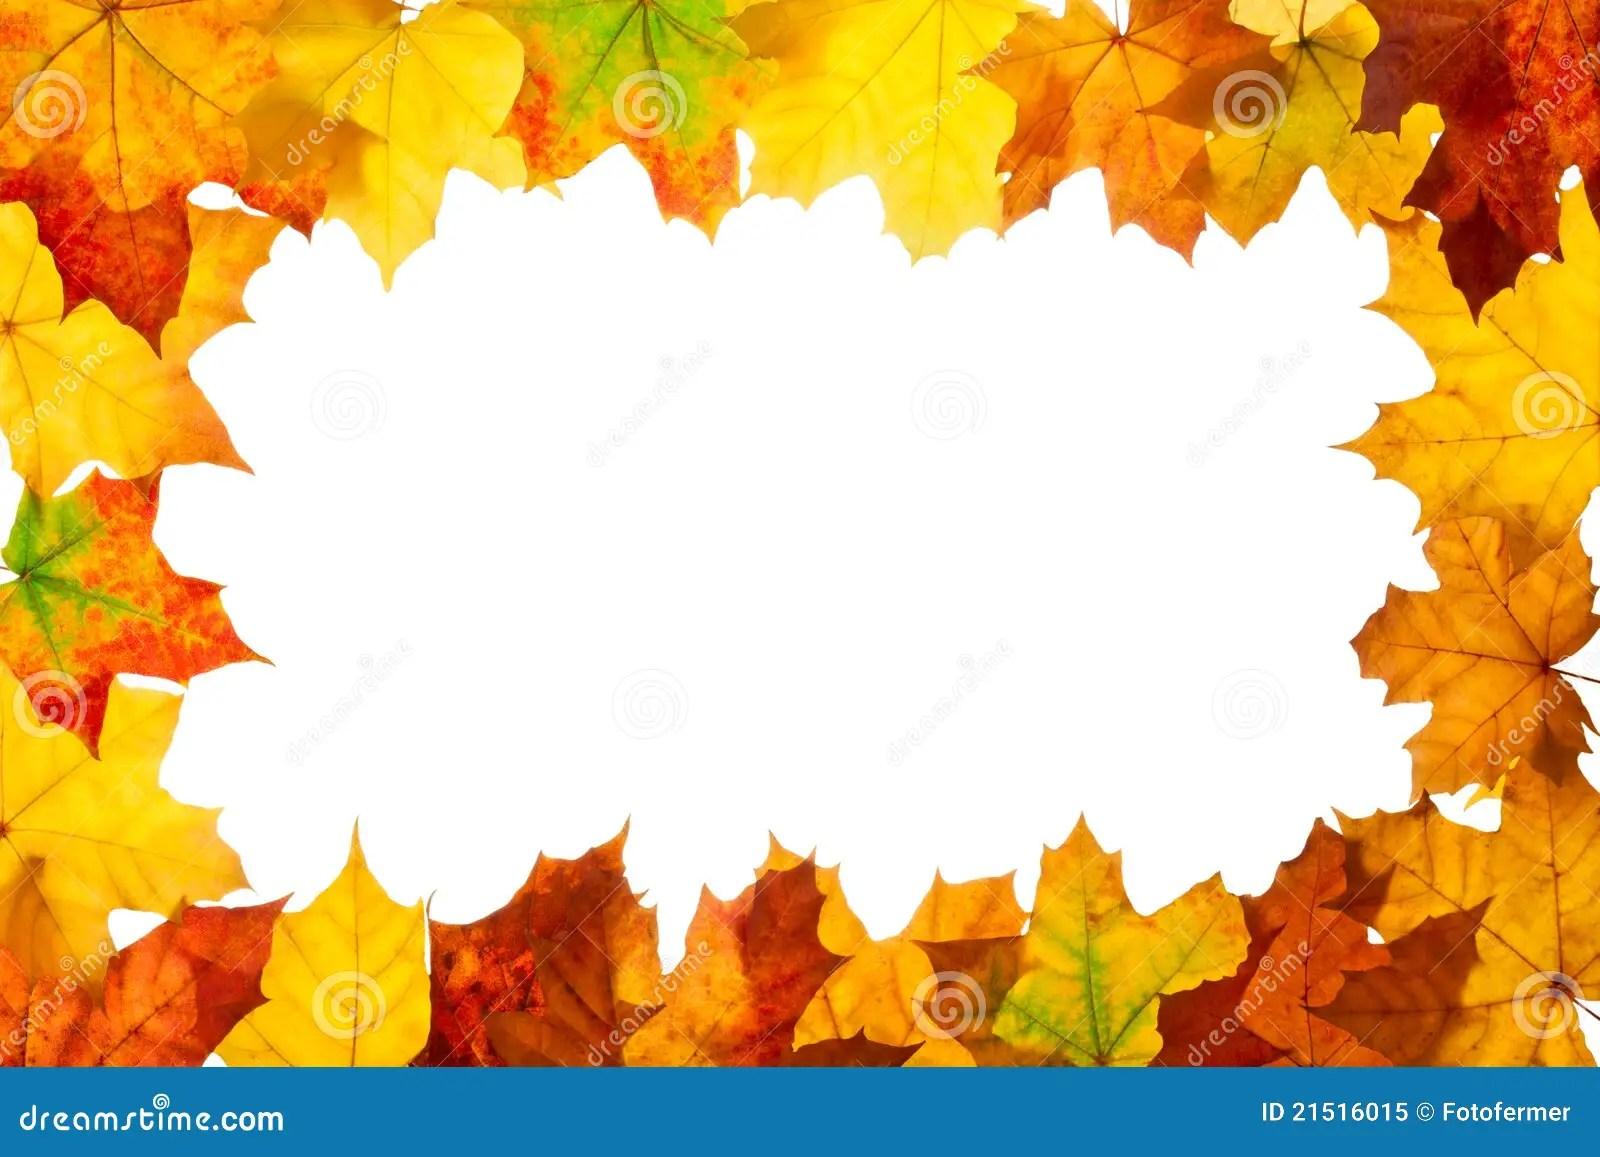 Falling Maple Leaves Wallpaper Frame Of Maple Autumn Leaves Stock Image Image 21516015